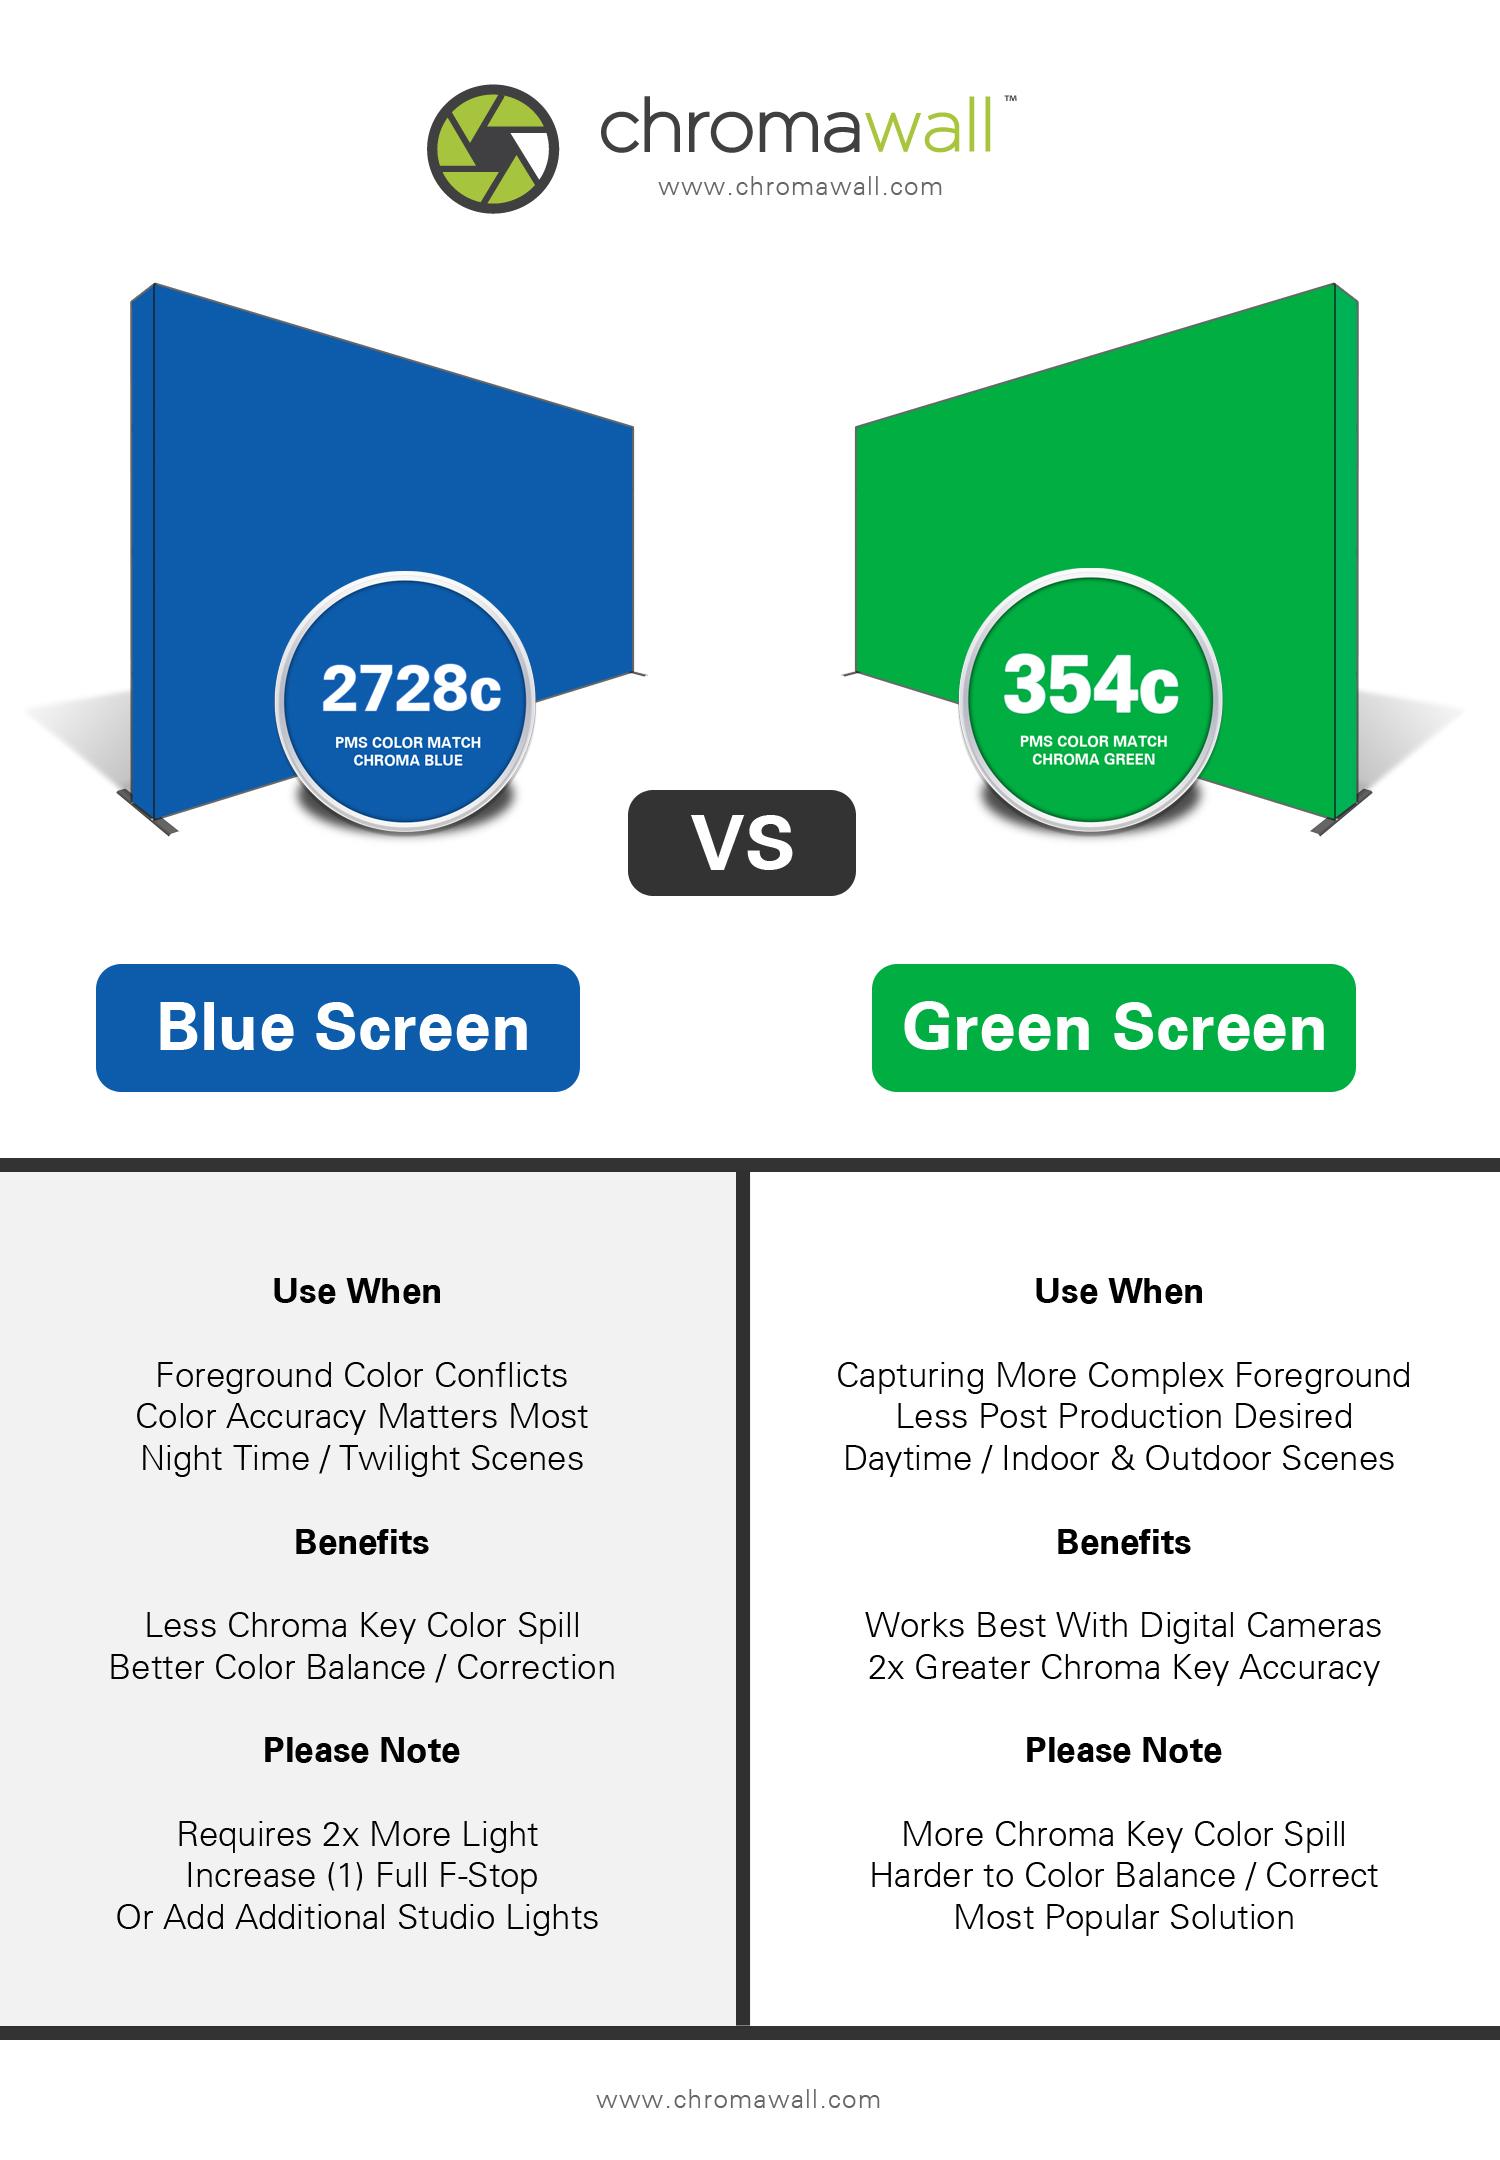 green screen vs. blue screen facts